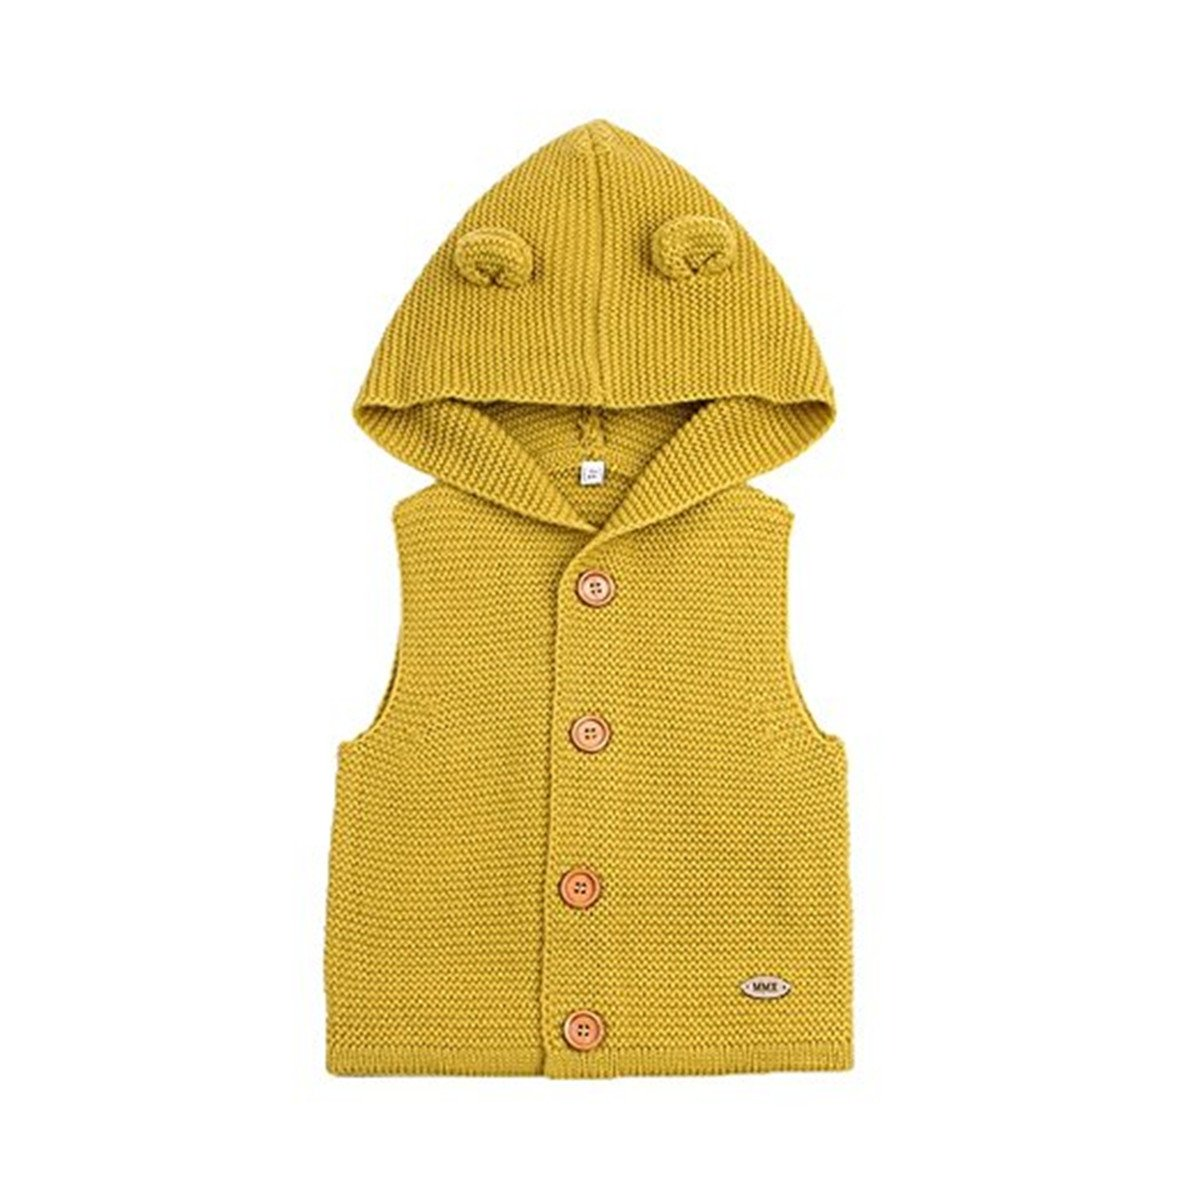 JELEUON Kids Toddler Little Girls Sleeveless Hooded Casual Button Up Jacket Knit Cardigan Sweater